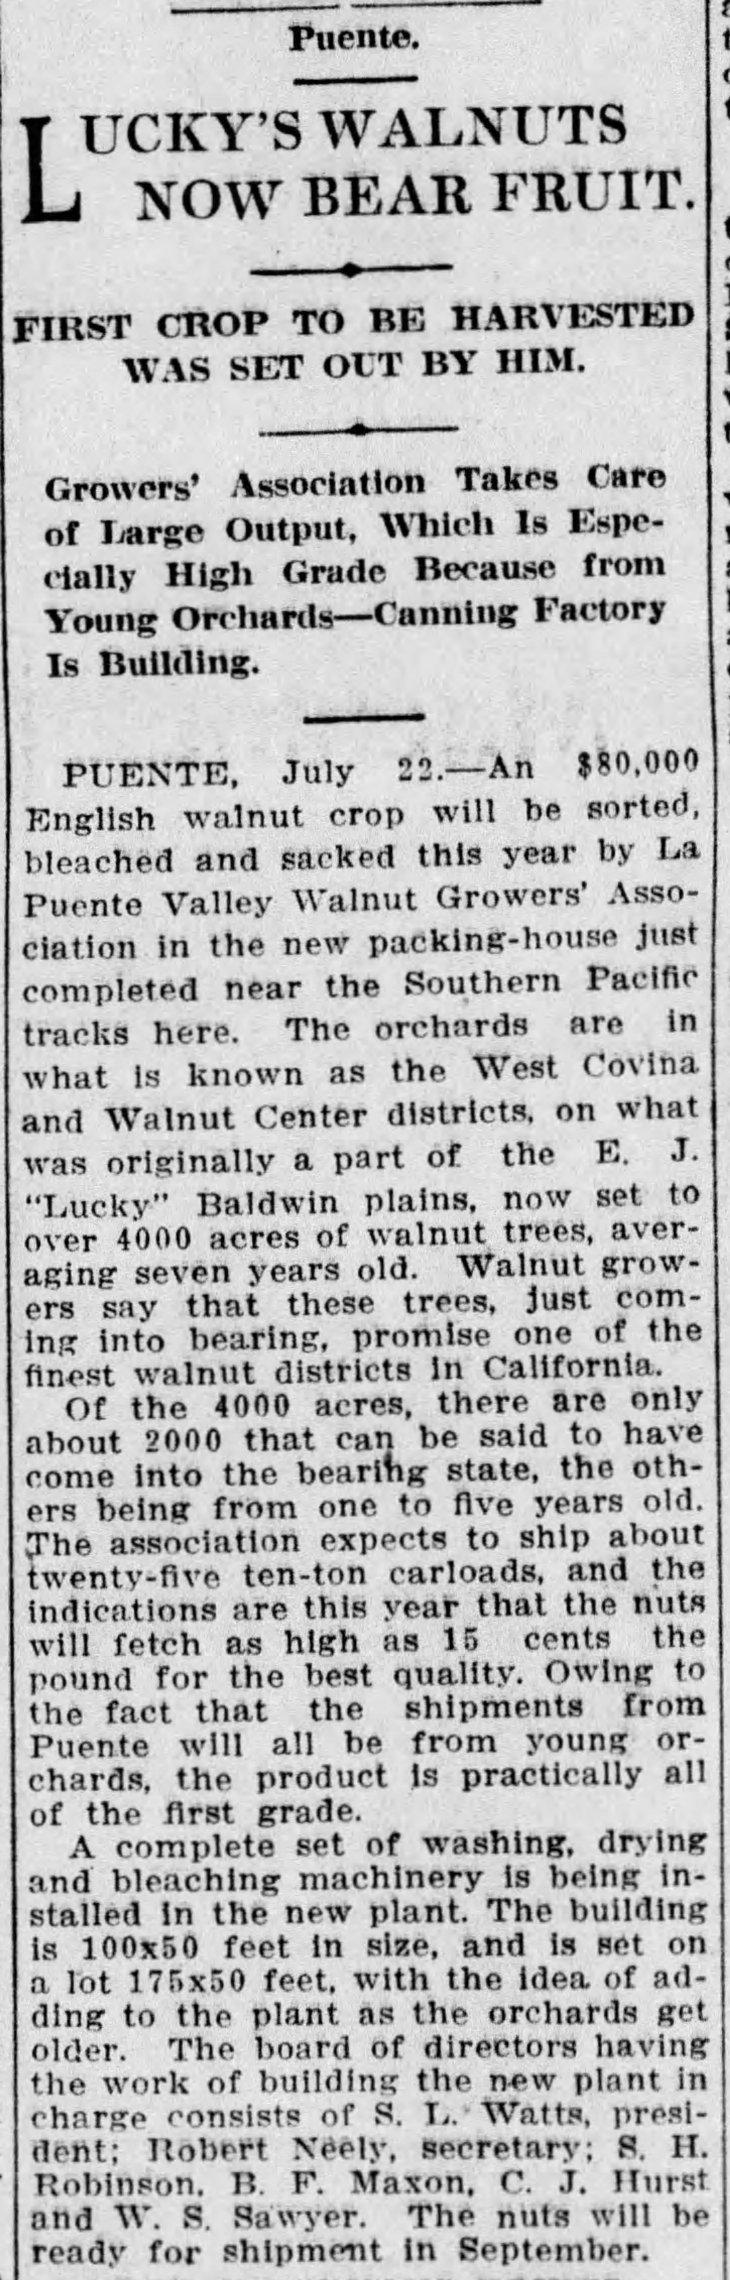 The_Los_Angeles_Times_Sun__Jul_27__1913_